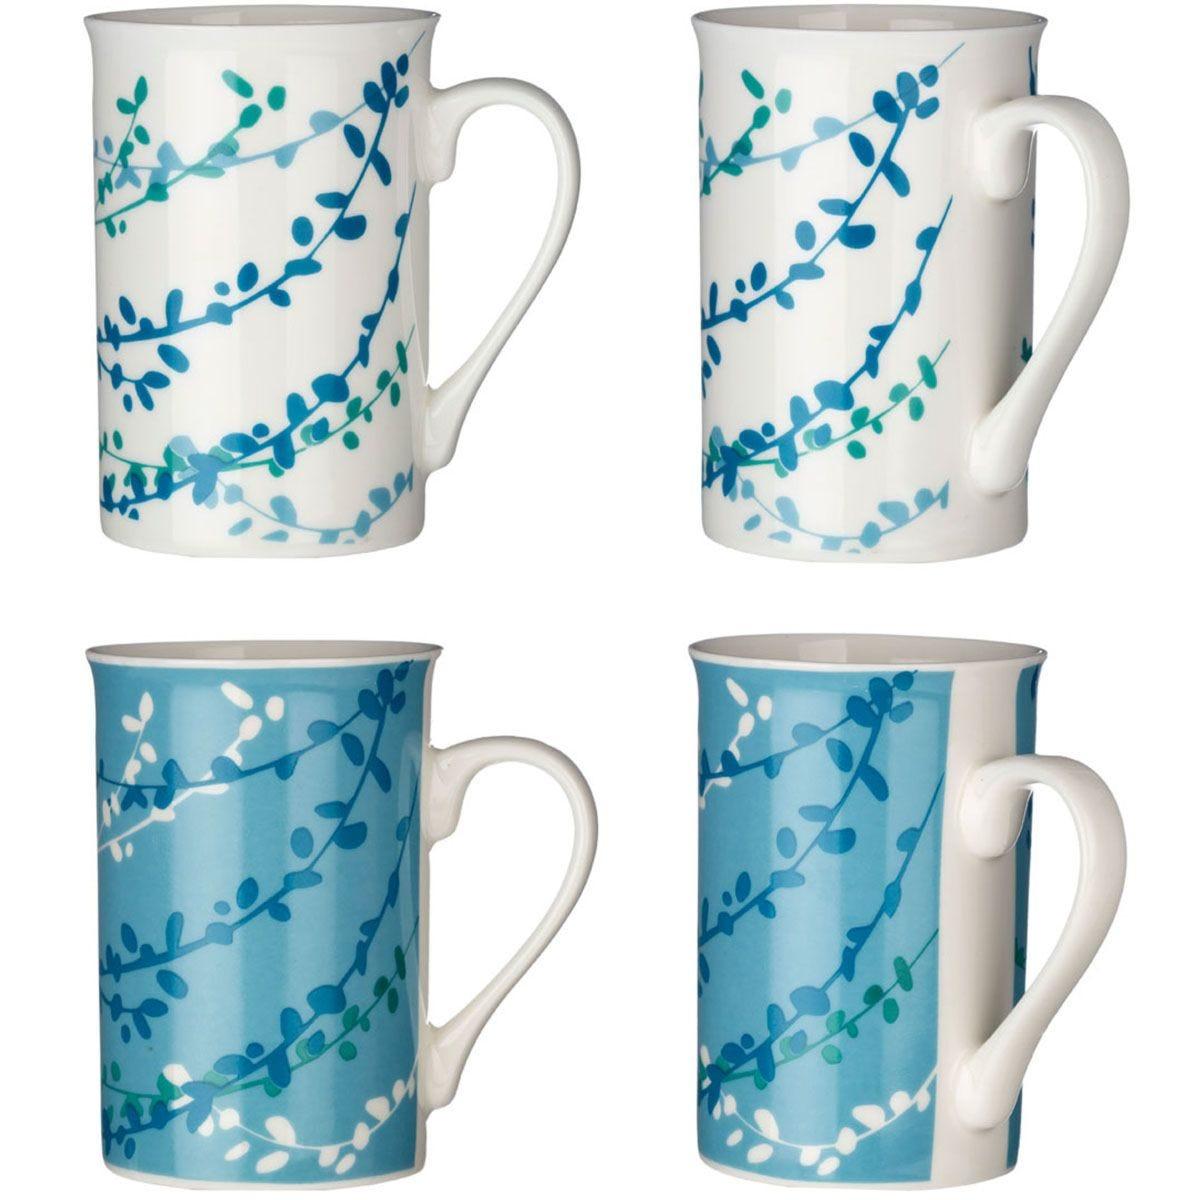 Premier Housewares Blue Willow Mugs - Set of 4